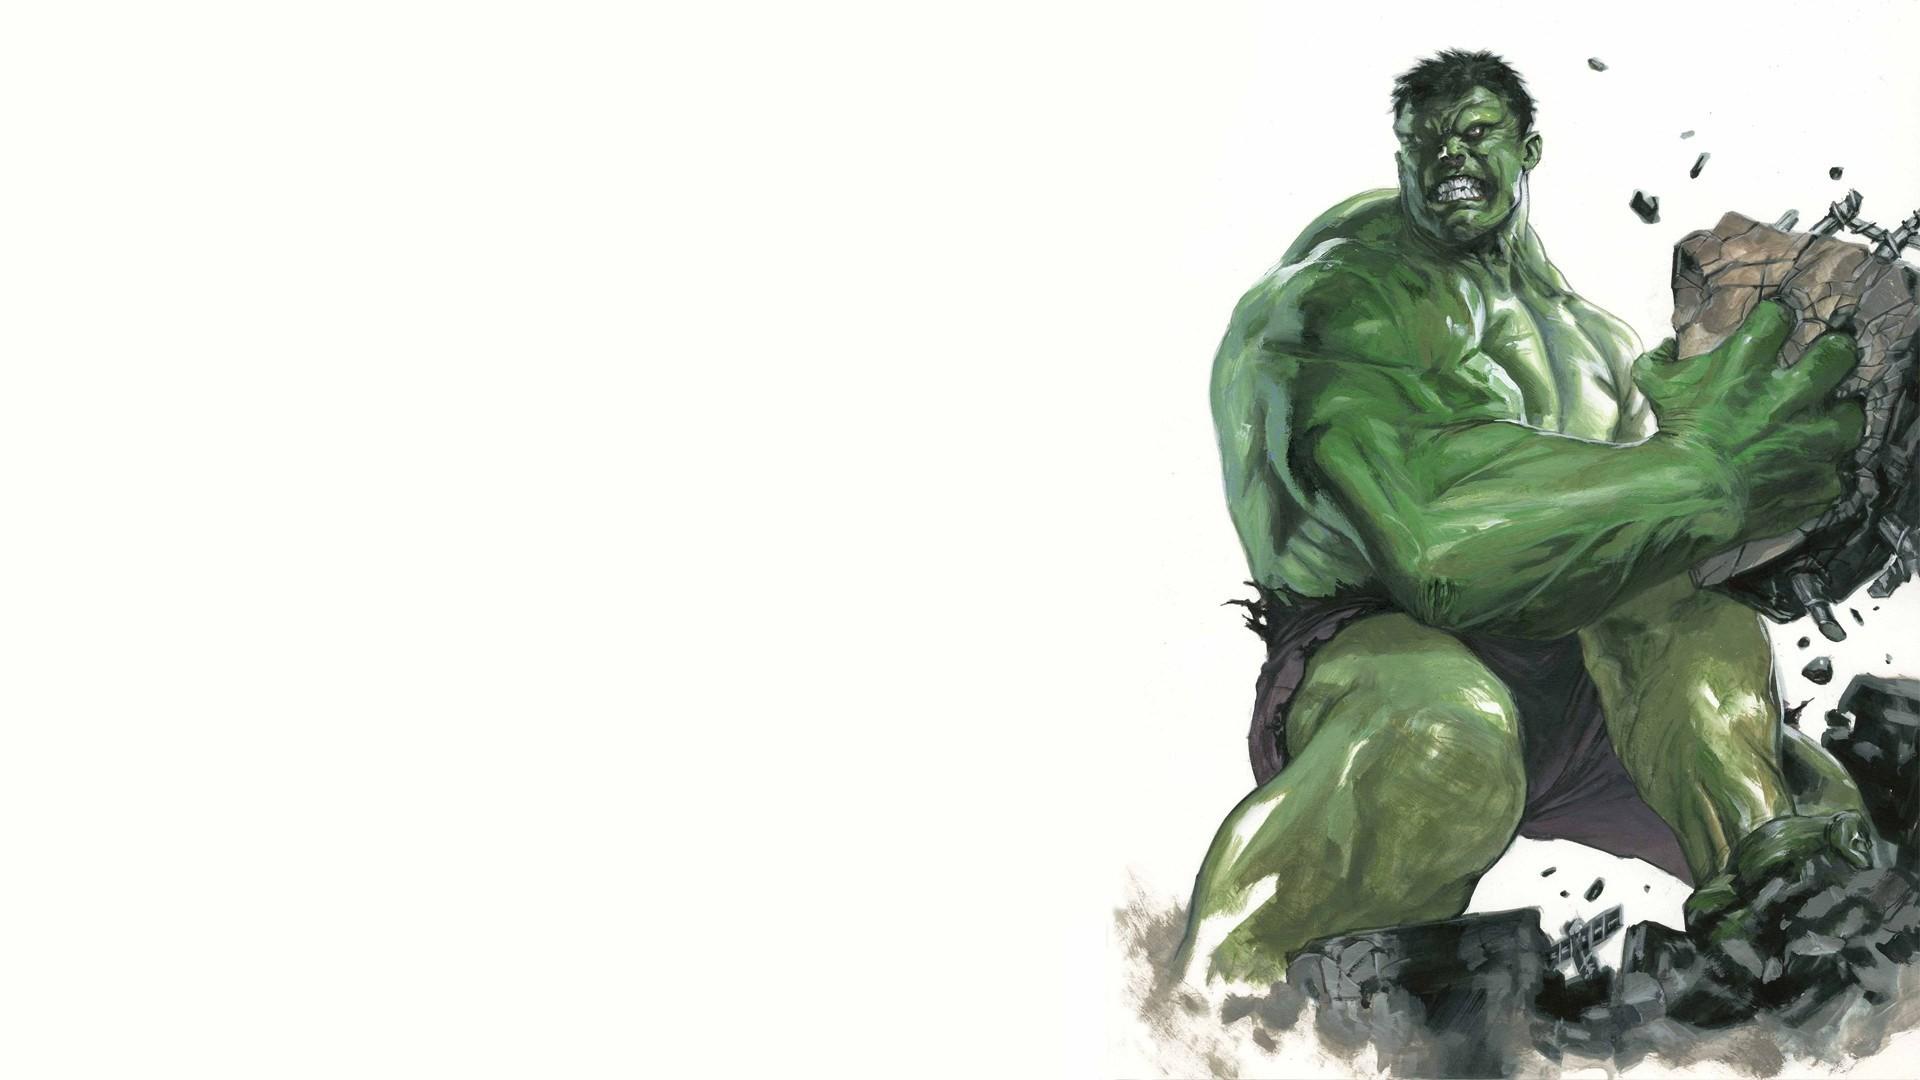 hd wallpaper hulk by Merritt Sheldon (2017-03-11)